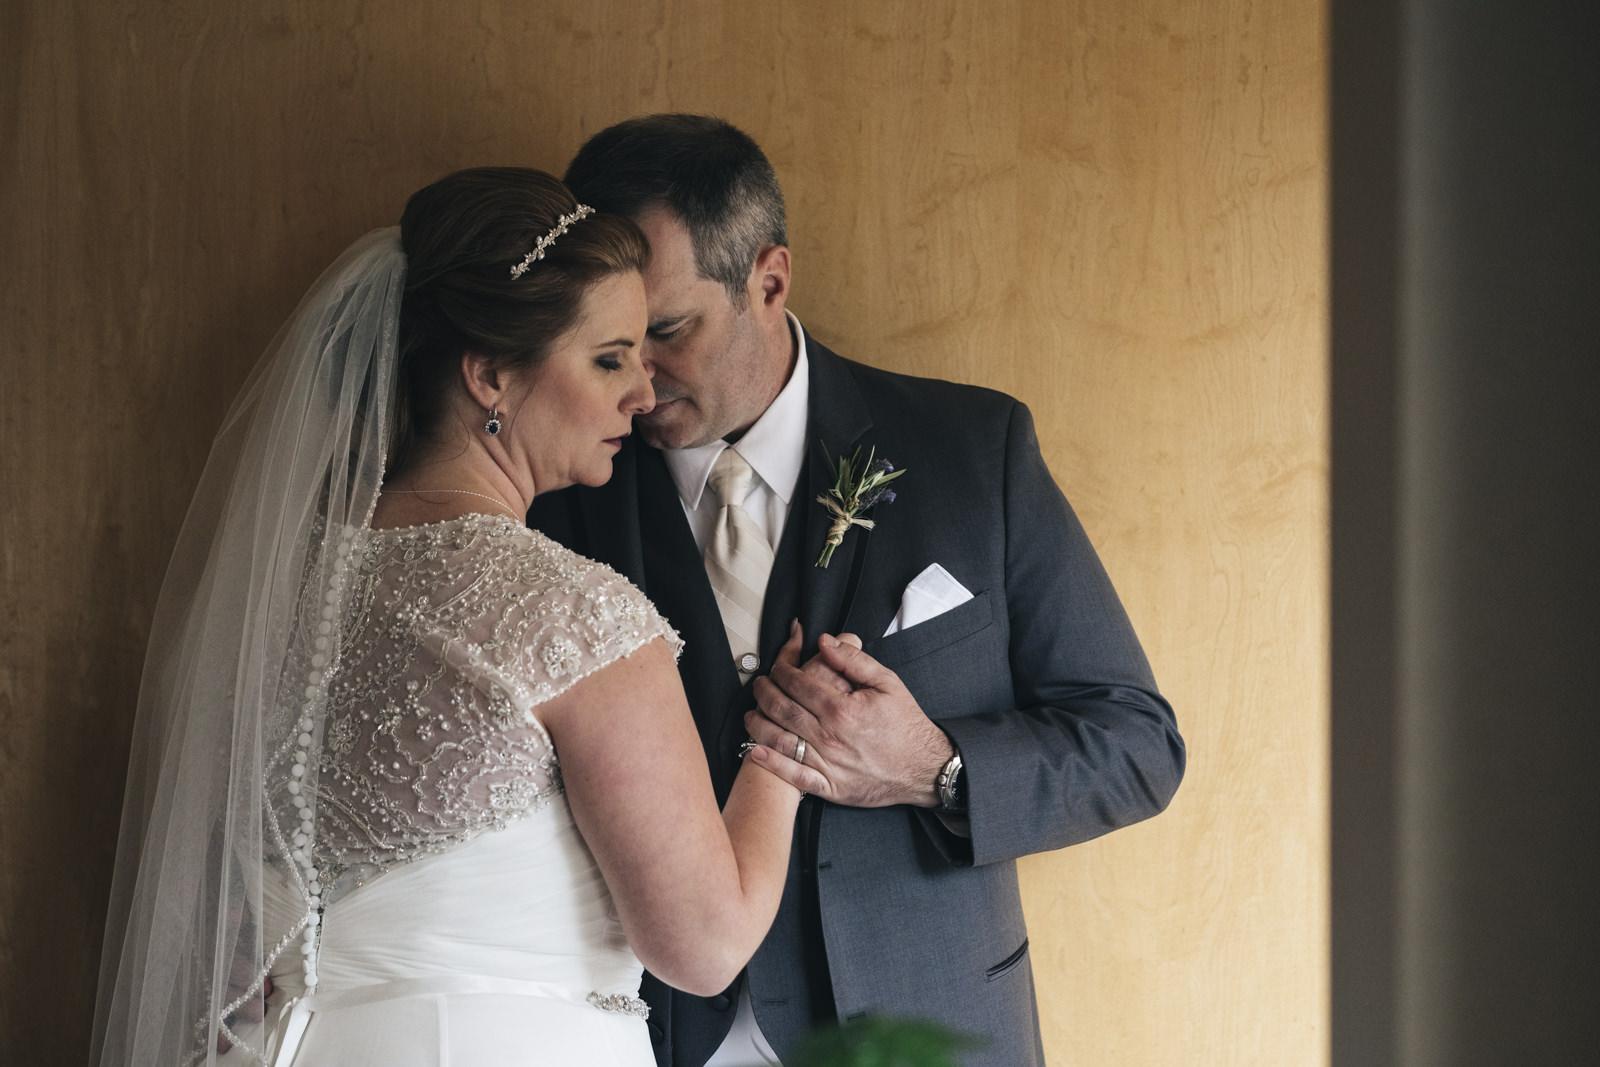 Bride and groom portrait at Hilton Garden Inn Toledo/Perrysburg.